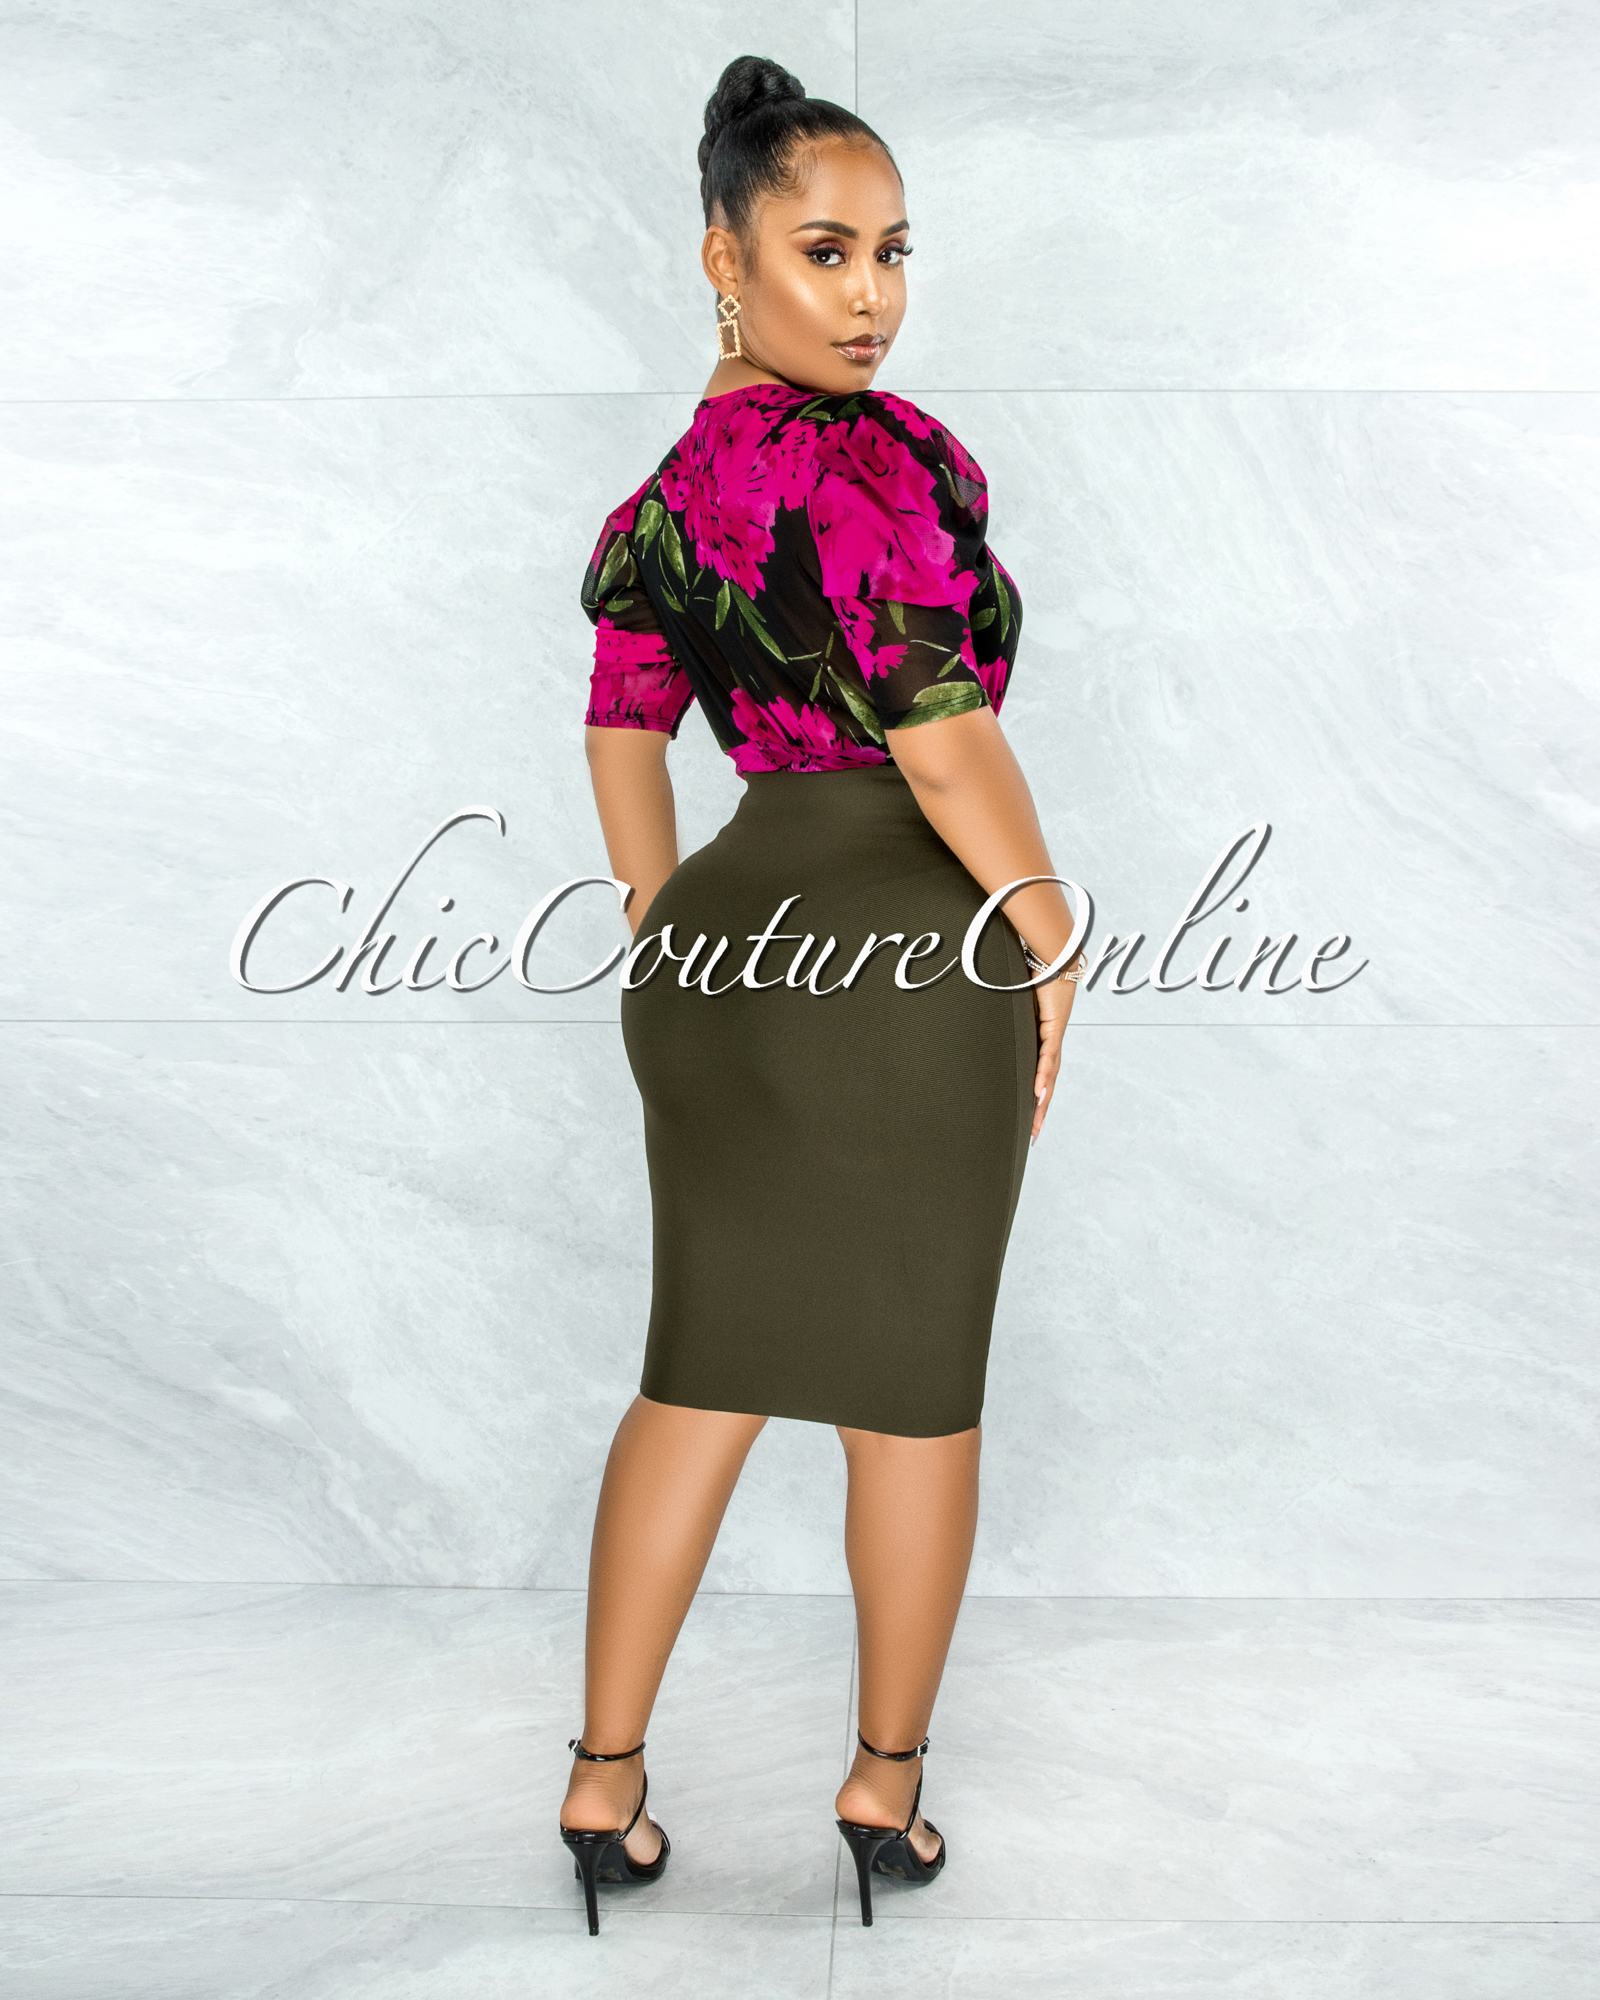 Drisana Black Fuchsia Floral Print Mesh Drape Bodysuit